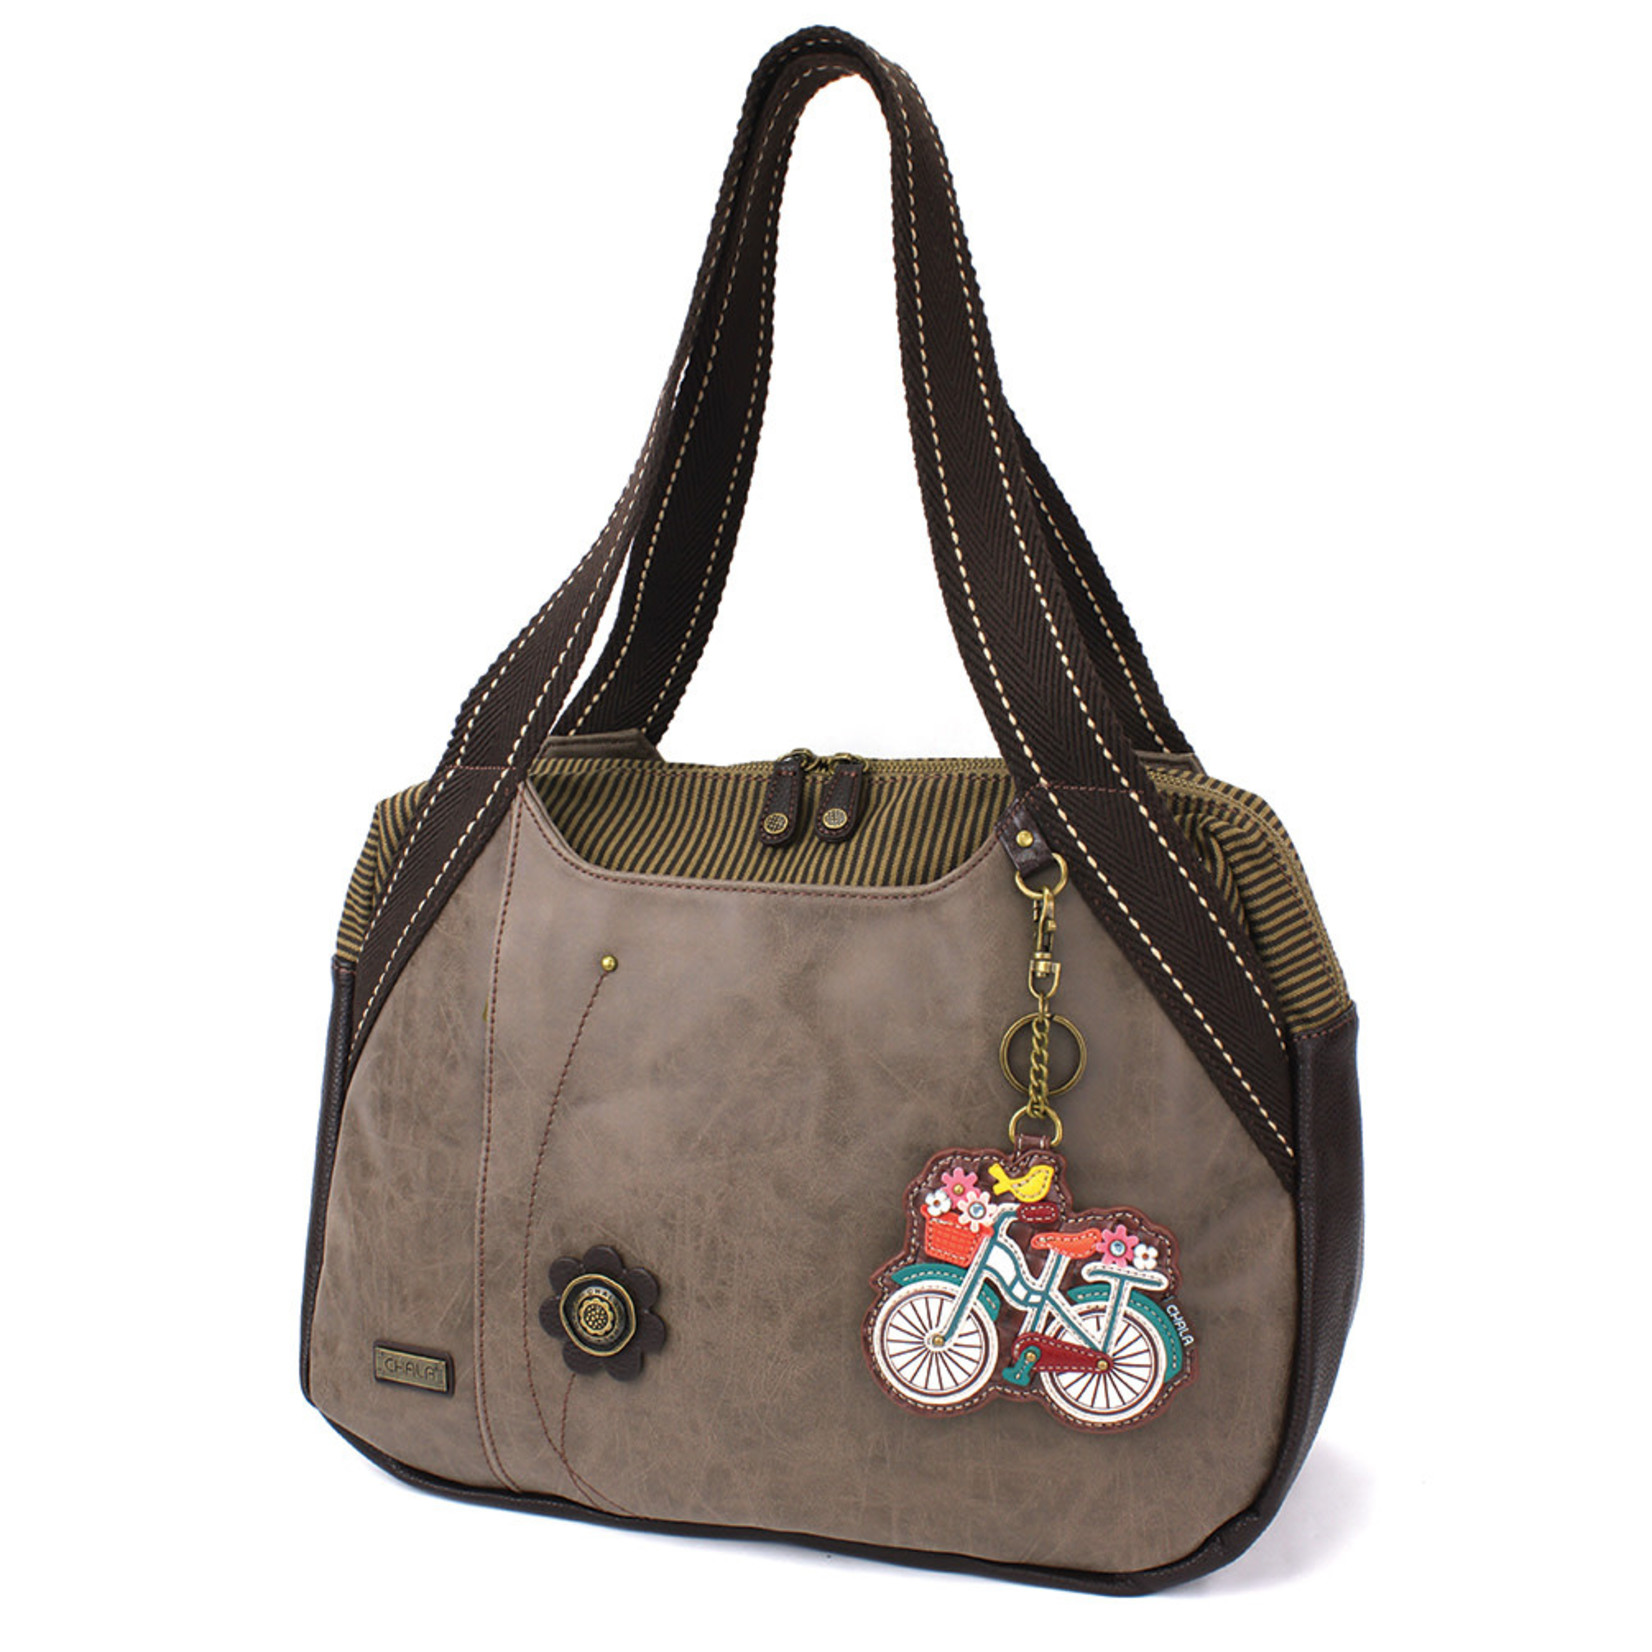 Chala Bowling Bag - Bicycle - Stone Gray